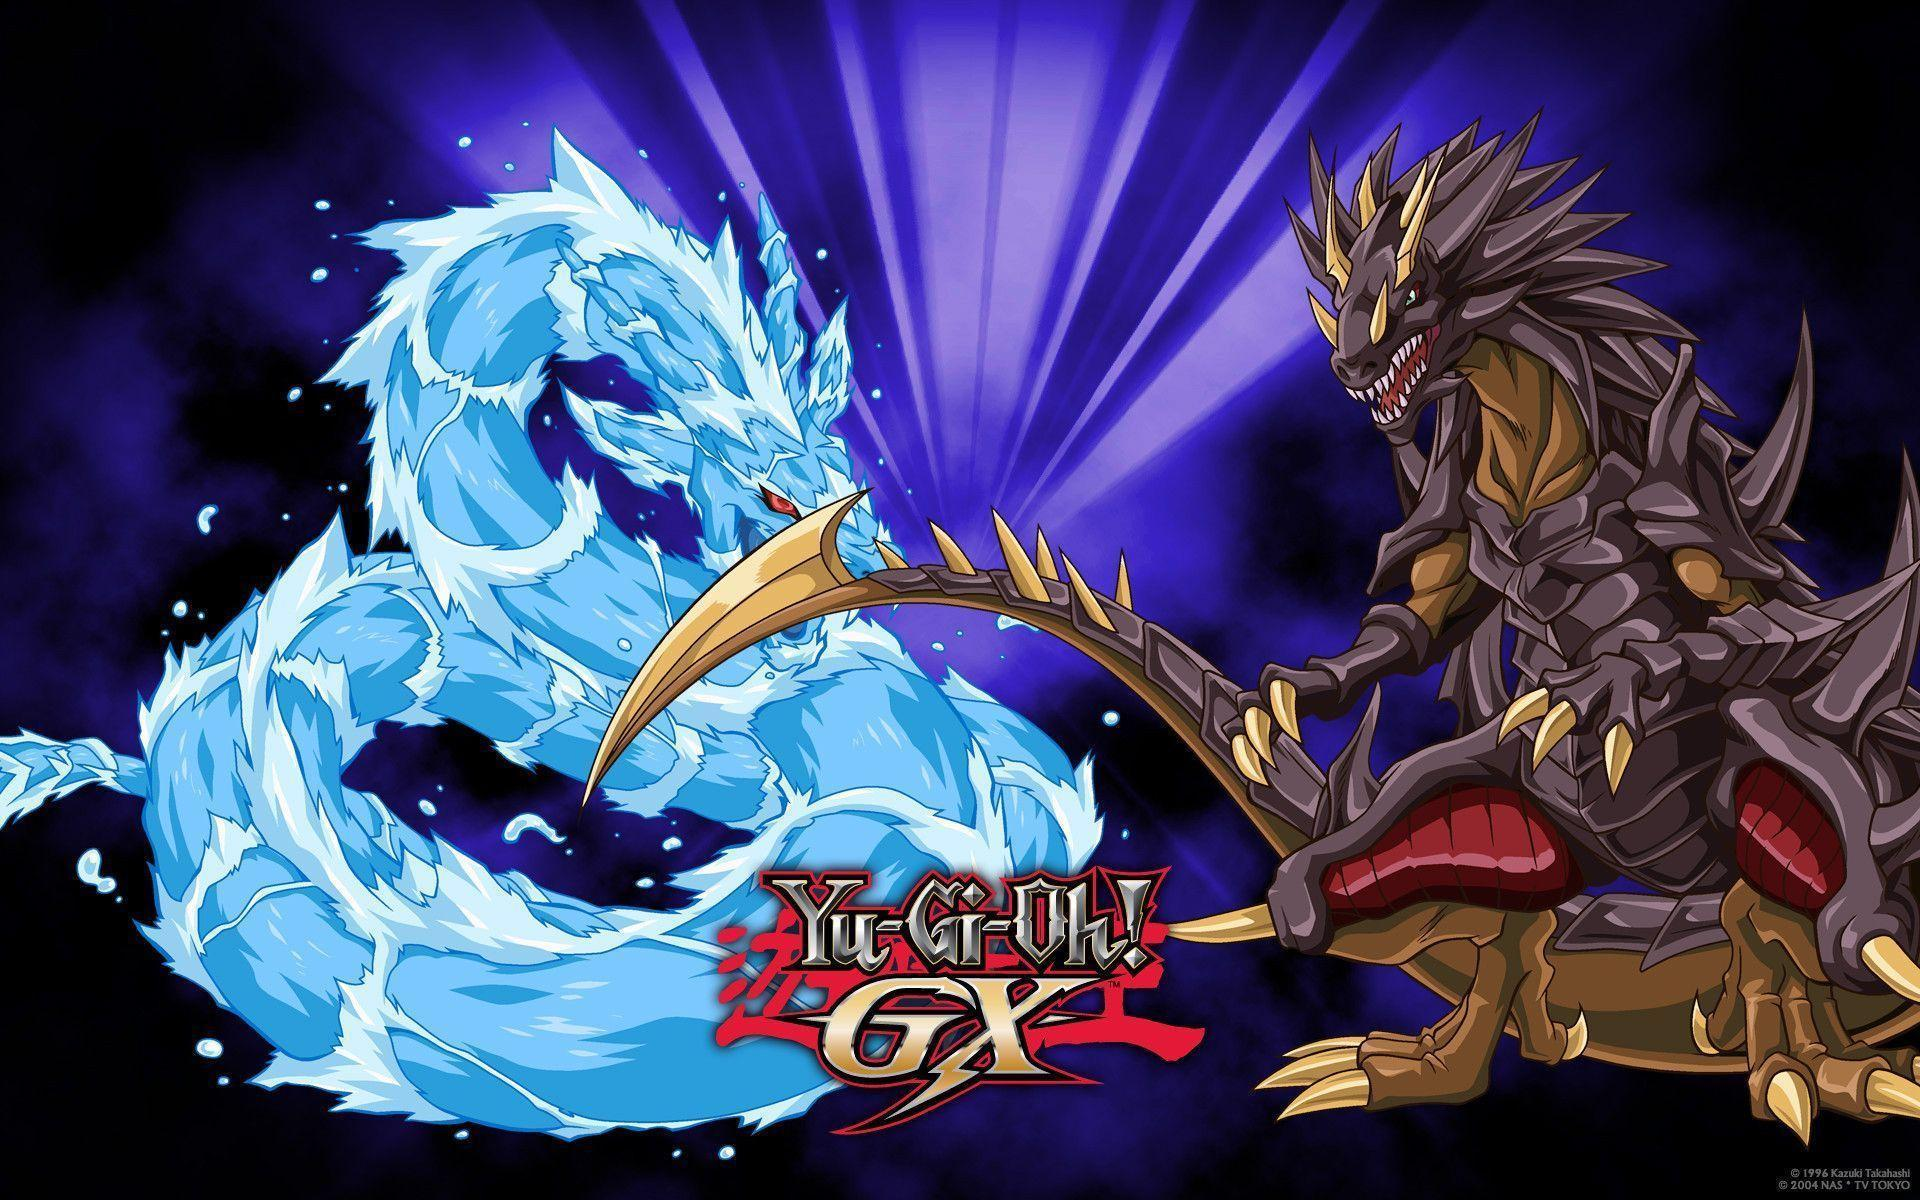 3 Headed Dragon Yu Gi Oh Red Eyes Black